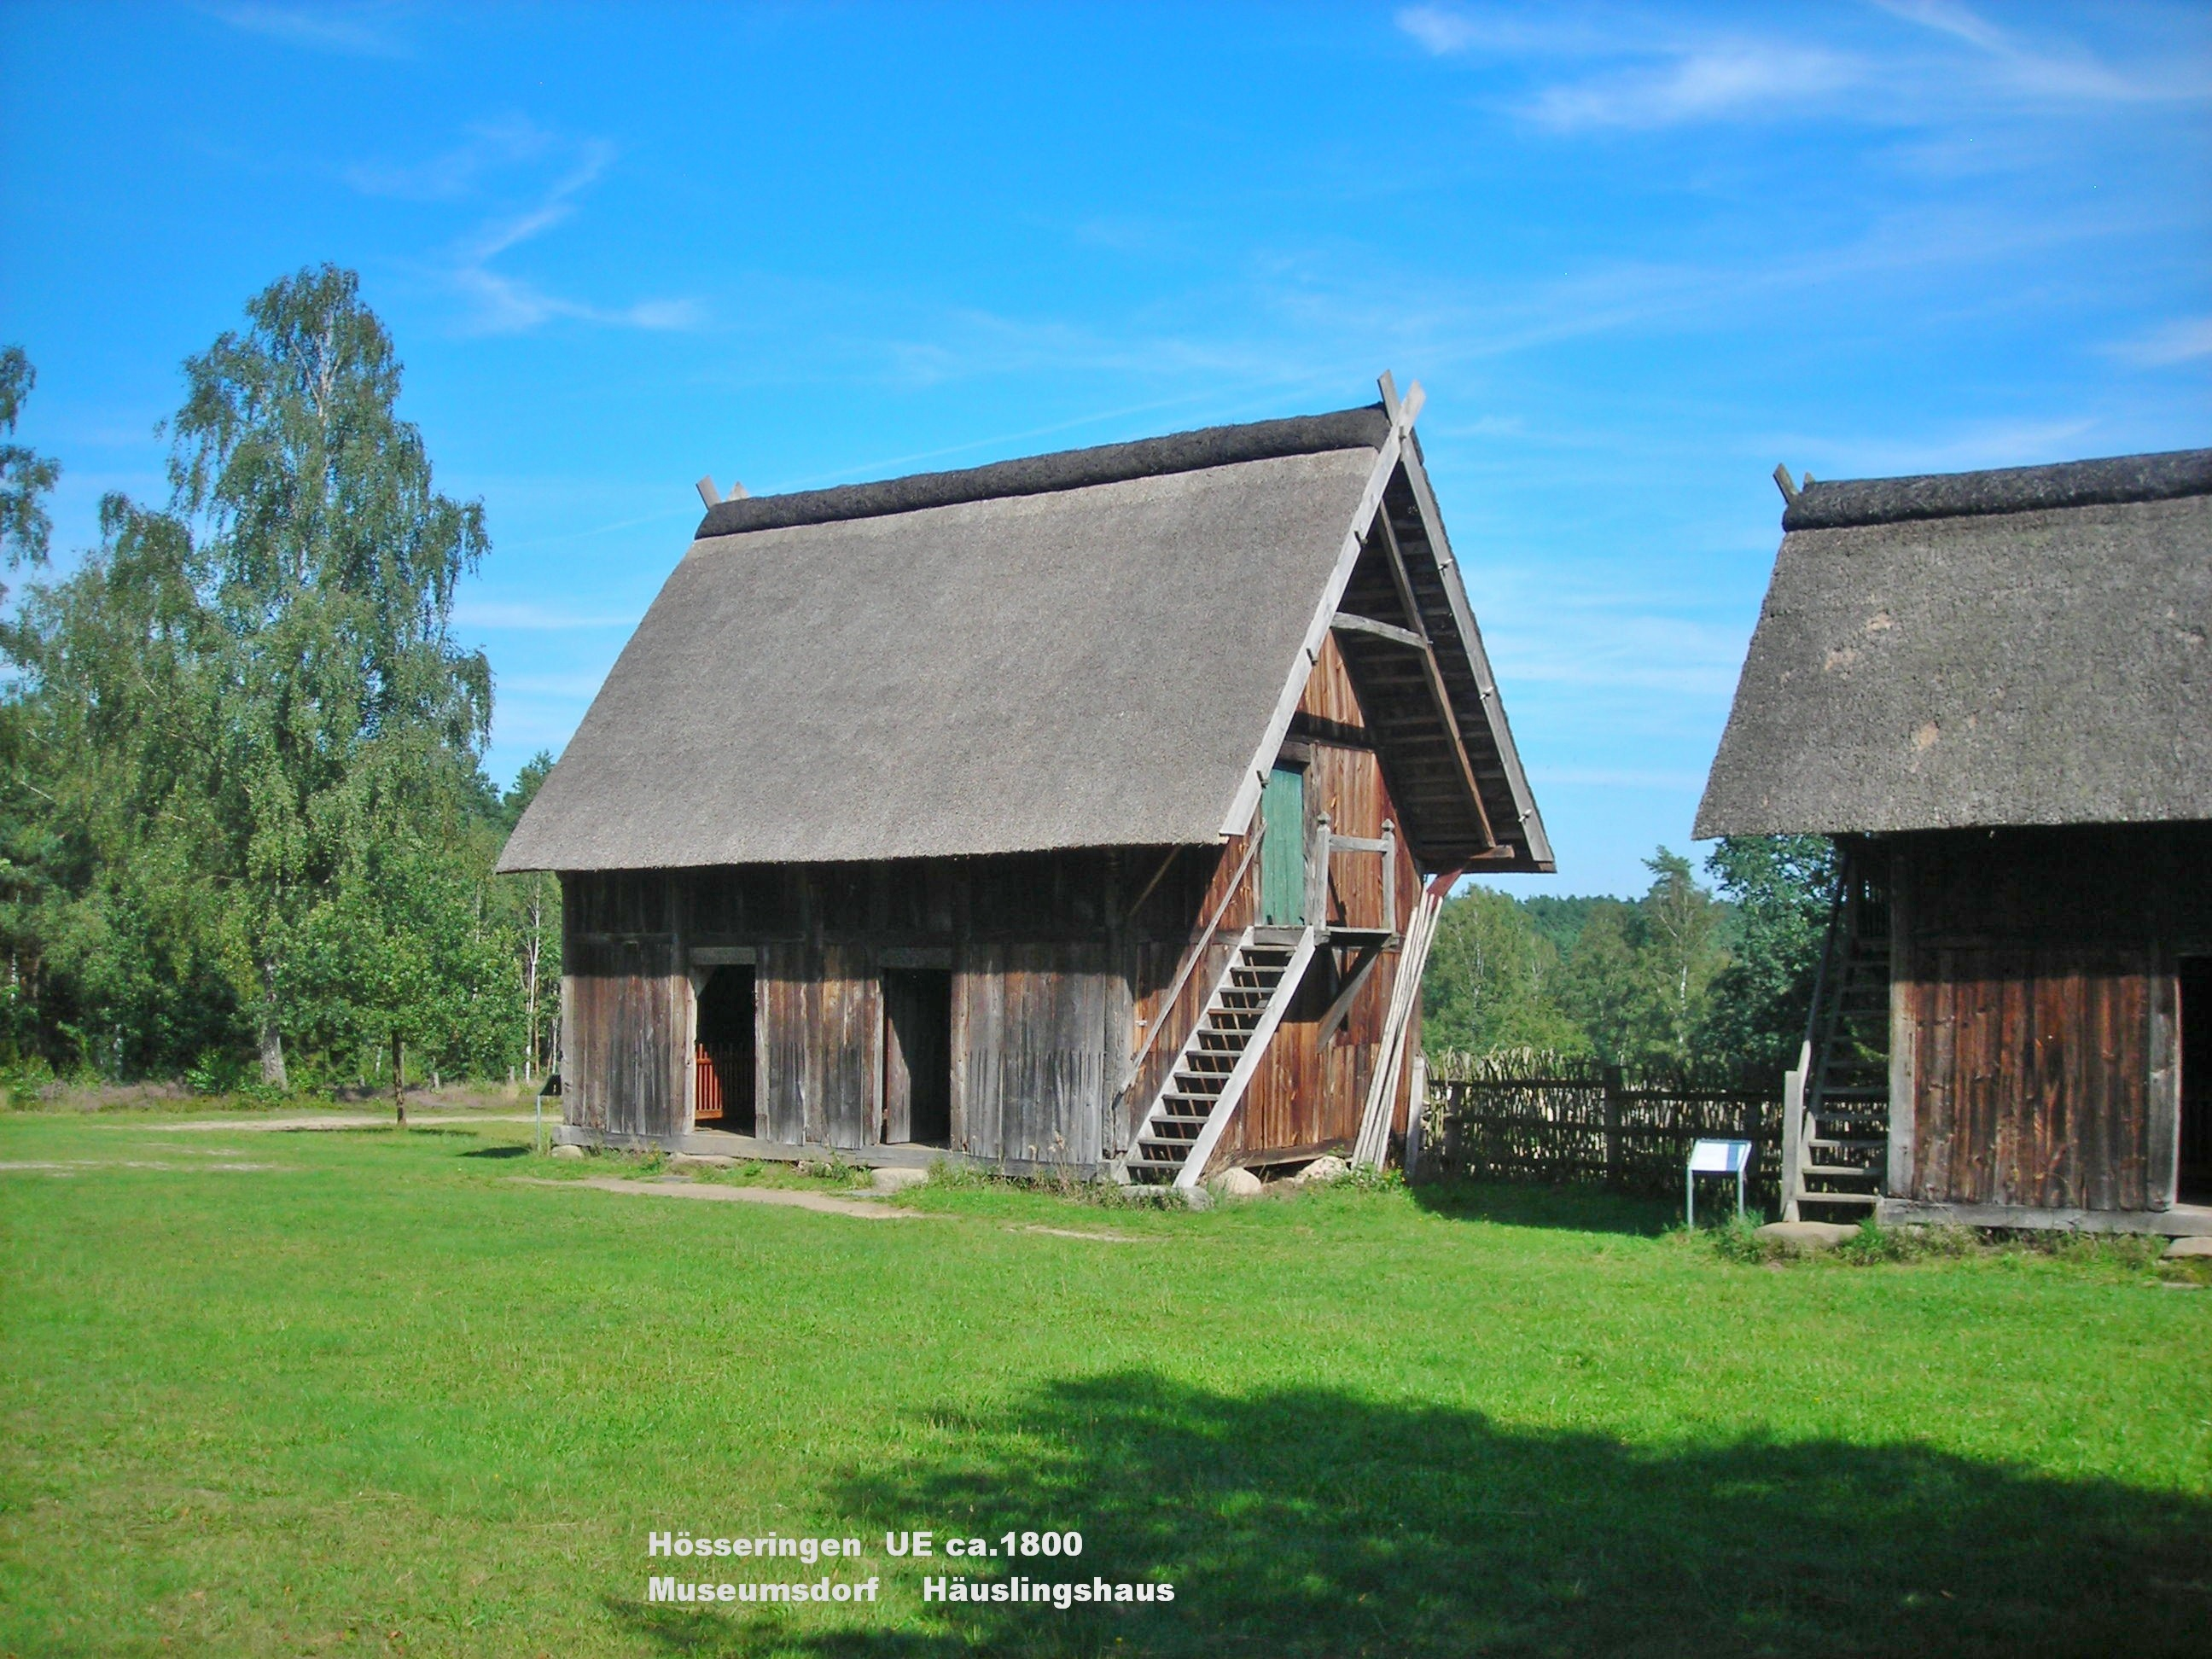 h-hoesseringen-ue-1860-haeuslingshaus